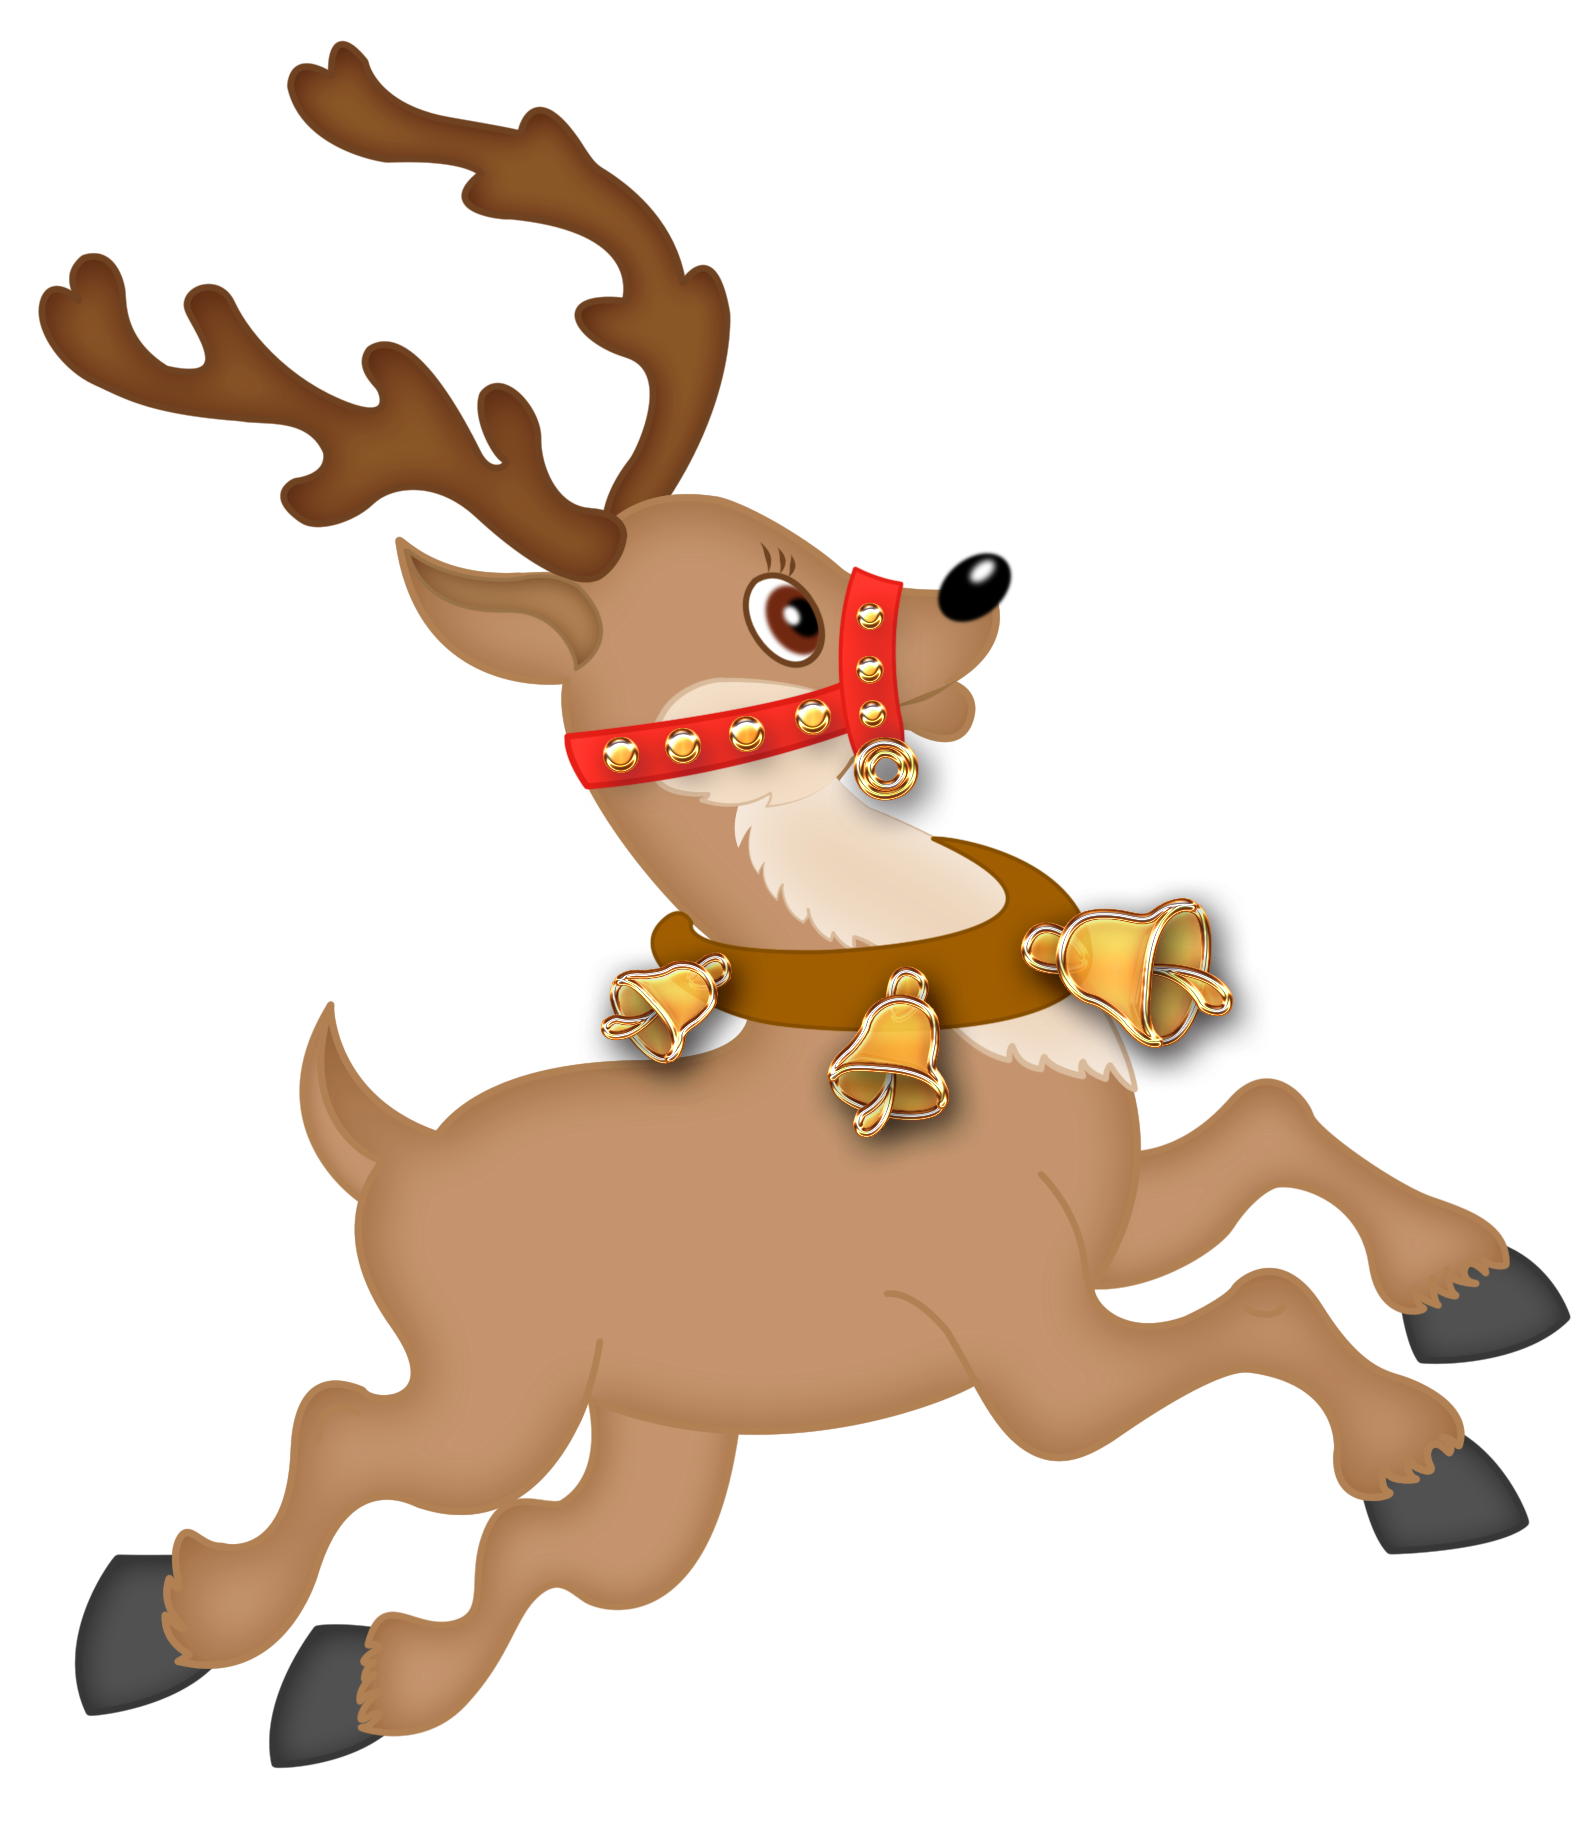 Cute Reindeer Png Clipart Png-Cute Reindeer Png Clipart Png-3